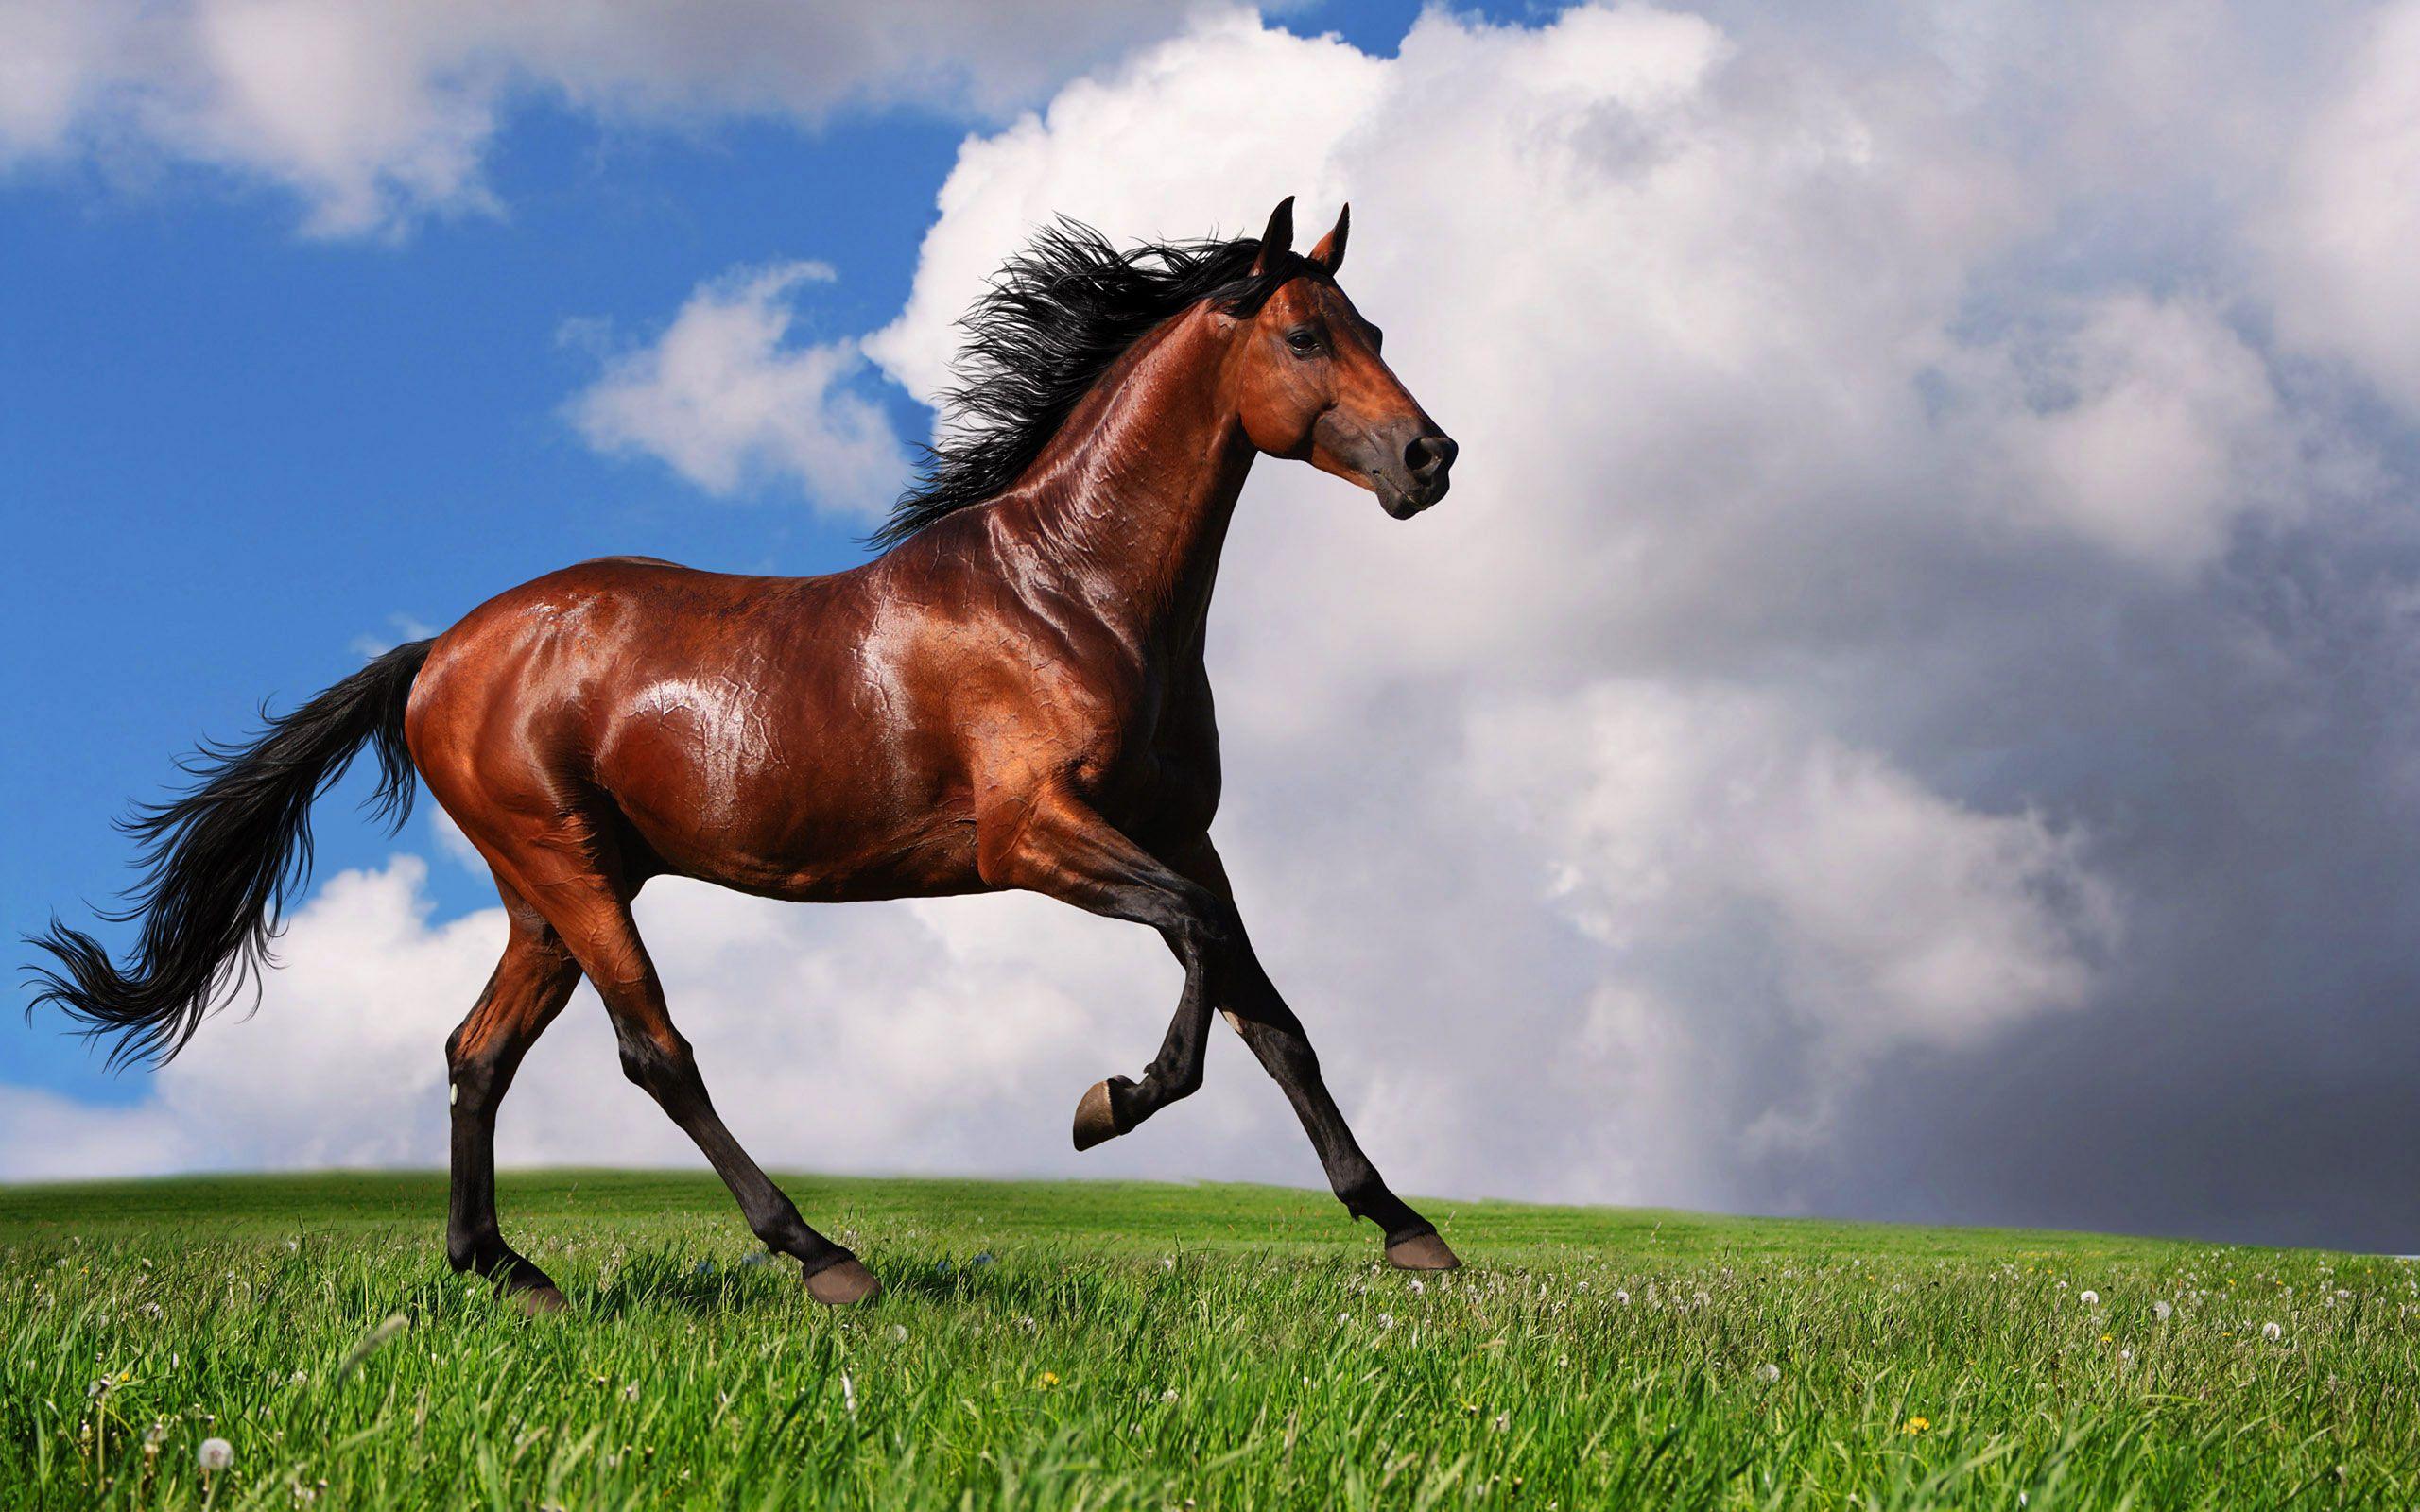 Must see Wallpaper Horse Pinterest - db8633c39a41221cdff3a7ac6e08a77e  2018_883946.jpg